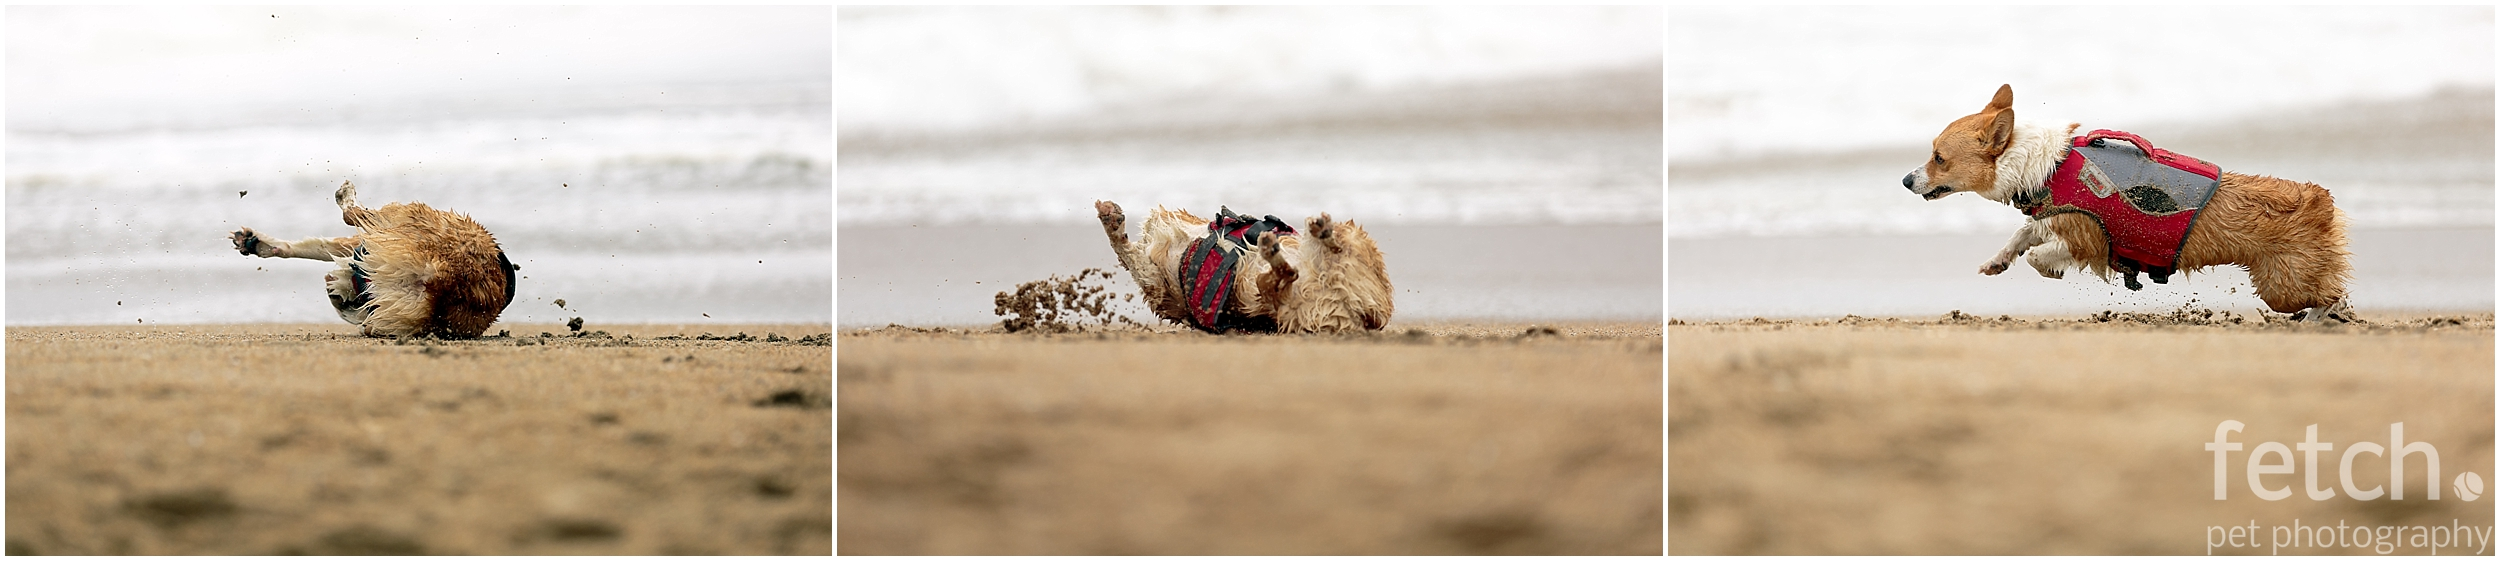 dog-rolls-in-sand-on-beach